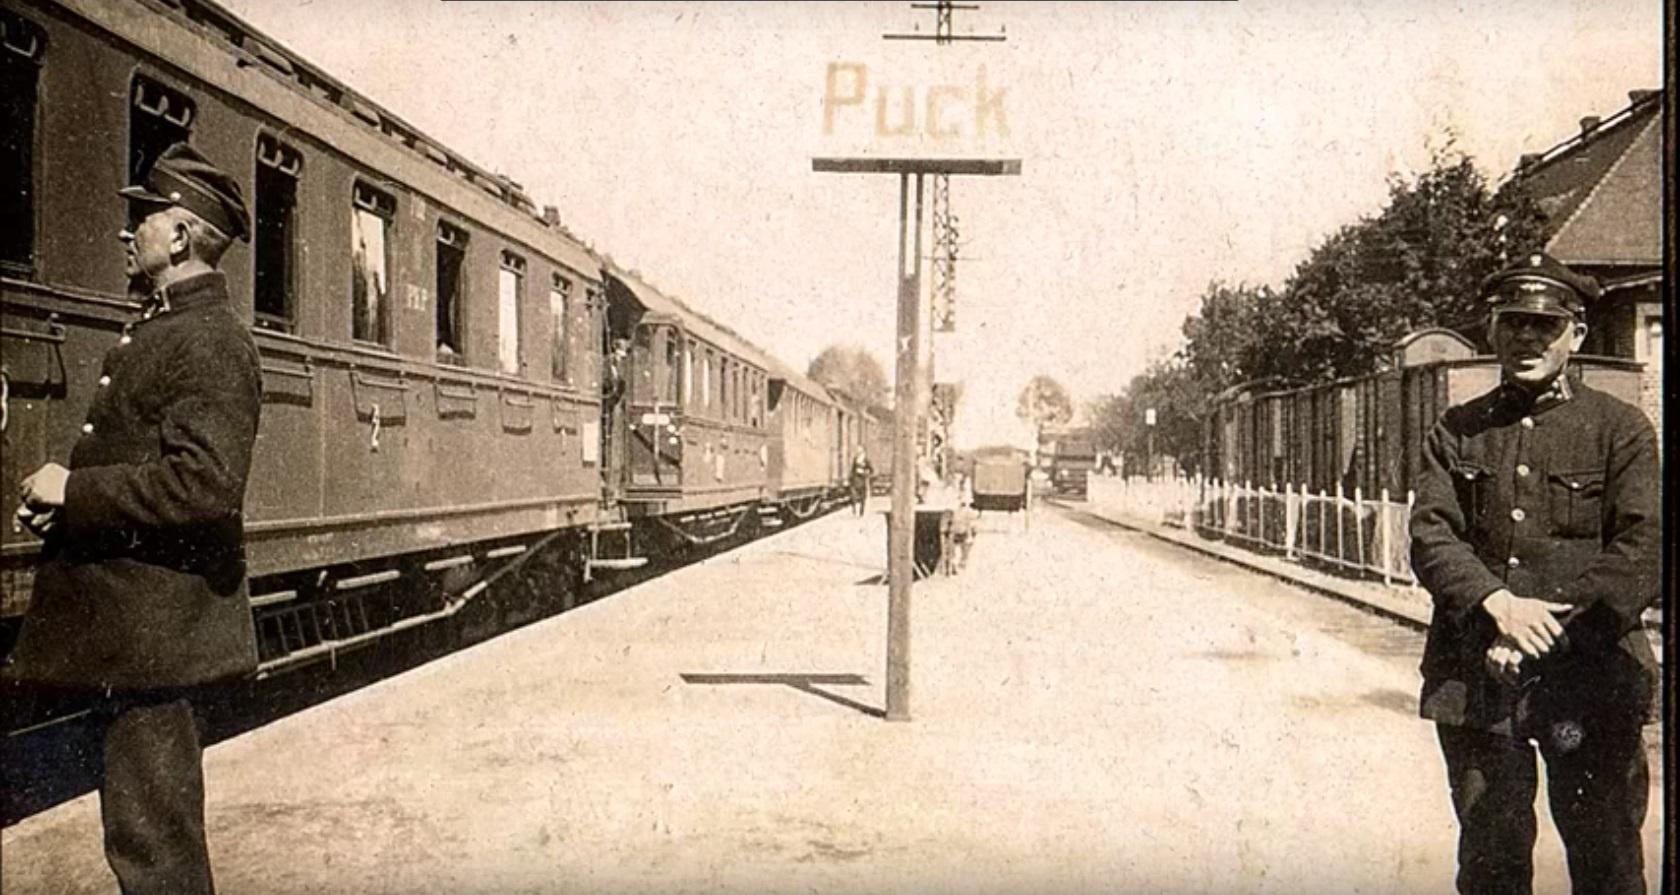 Puck 1929.jpg